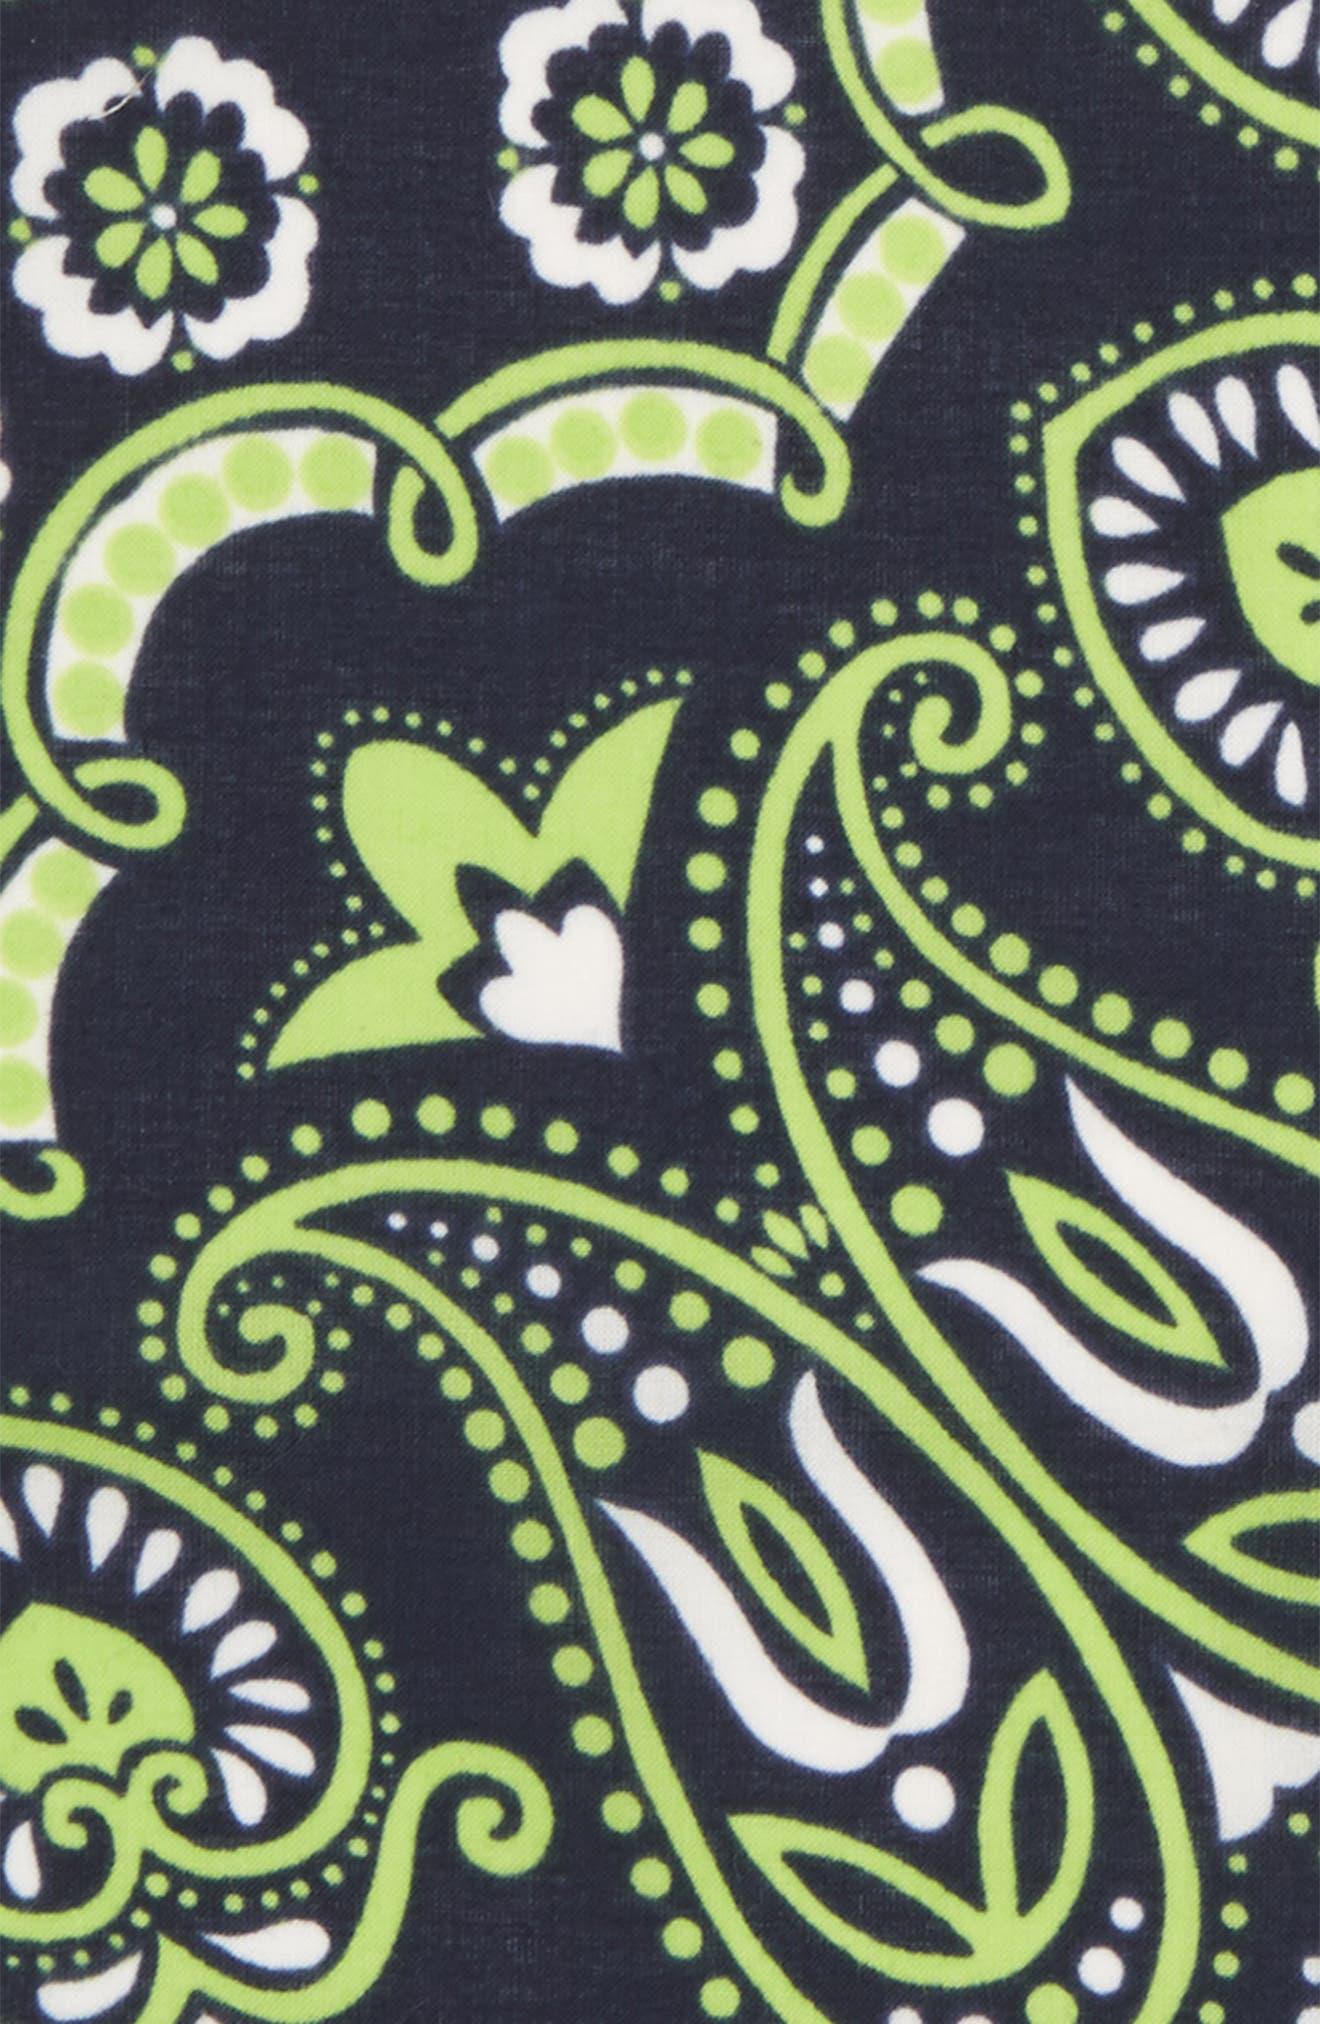 Neon Paisley Cotton Pocket Square,                             Alternate thumbnail 3, color,                             400